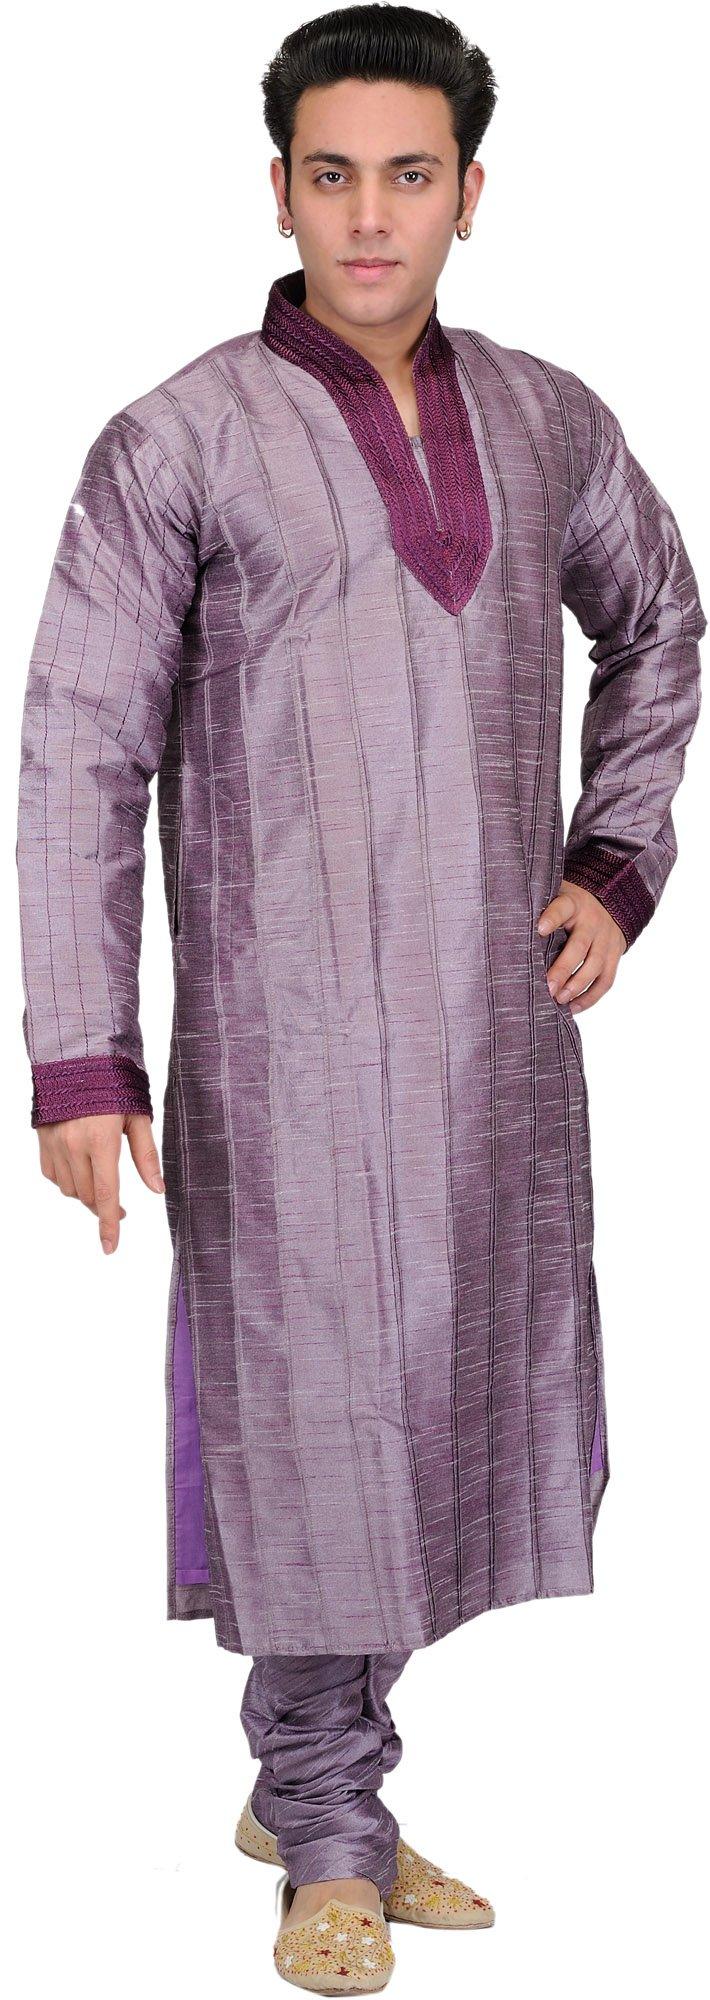 Exotic India Lavender-Gray Wedding Kurta Pajama with Pa Size 40 by Exotic India